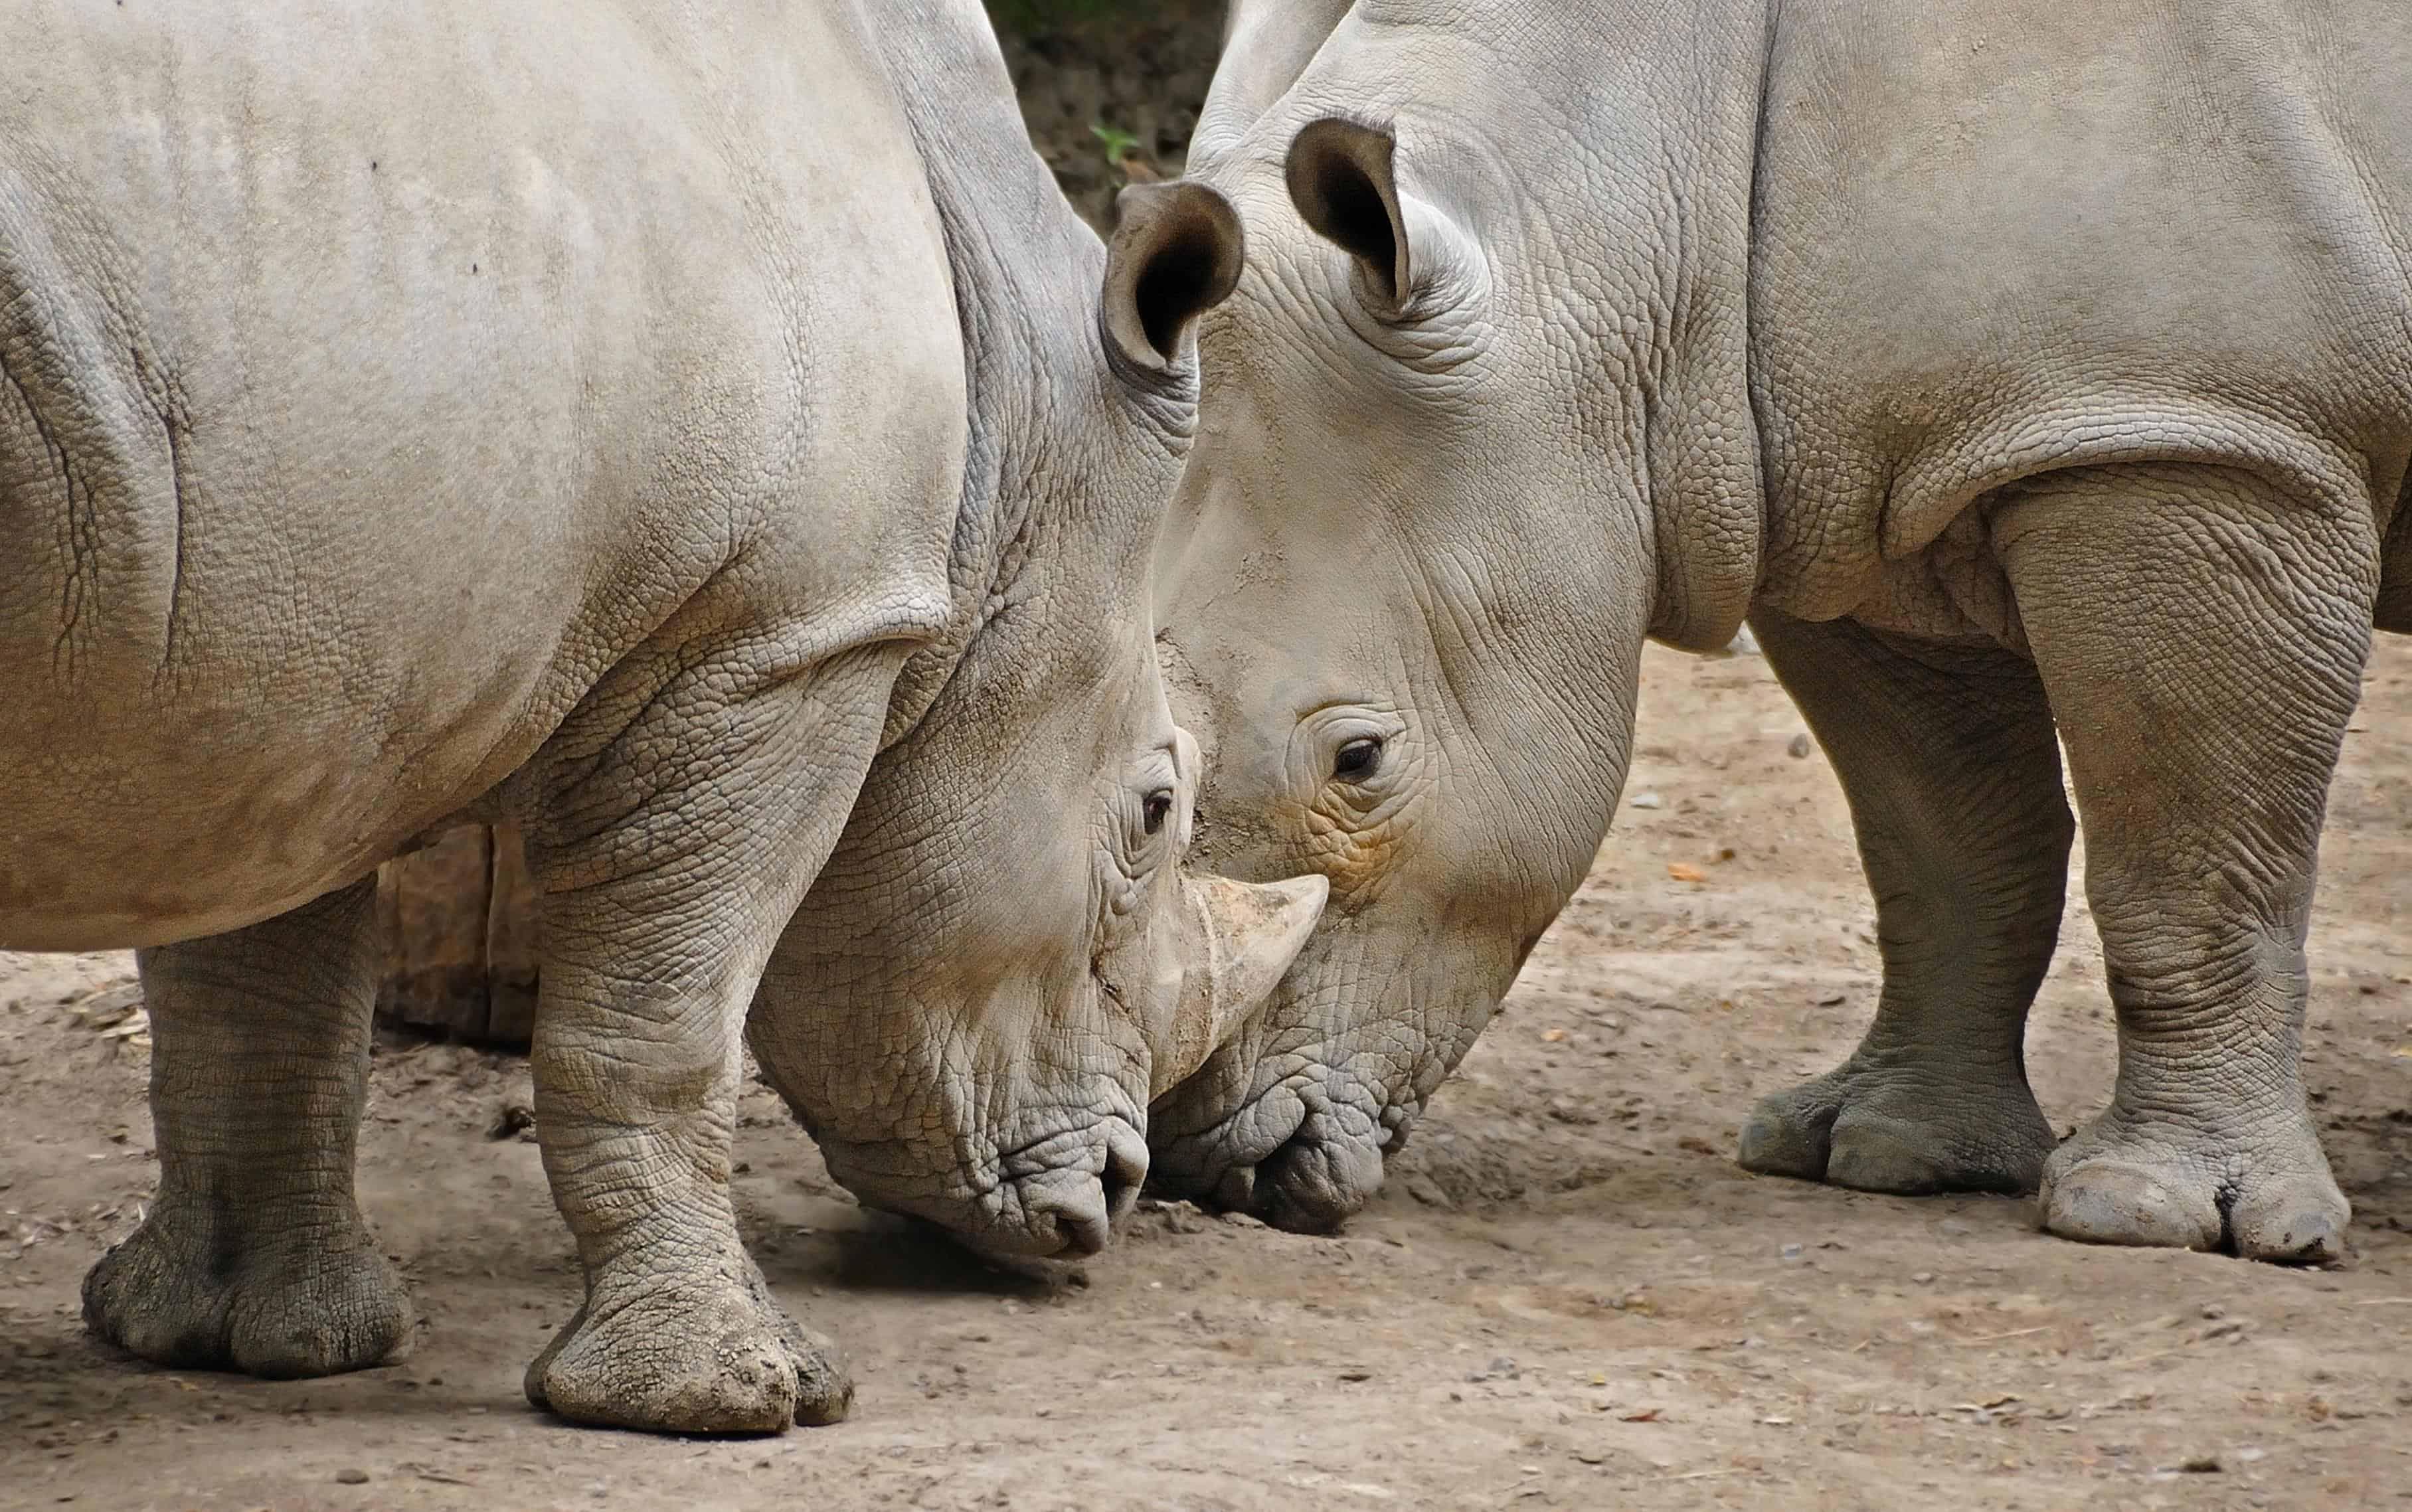 Image Libre: Afrique, Rhinocéros, Safari, Animaux Sauvages avec Animaux Sauvages De L Afrique